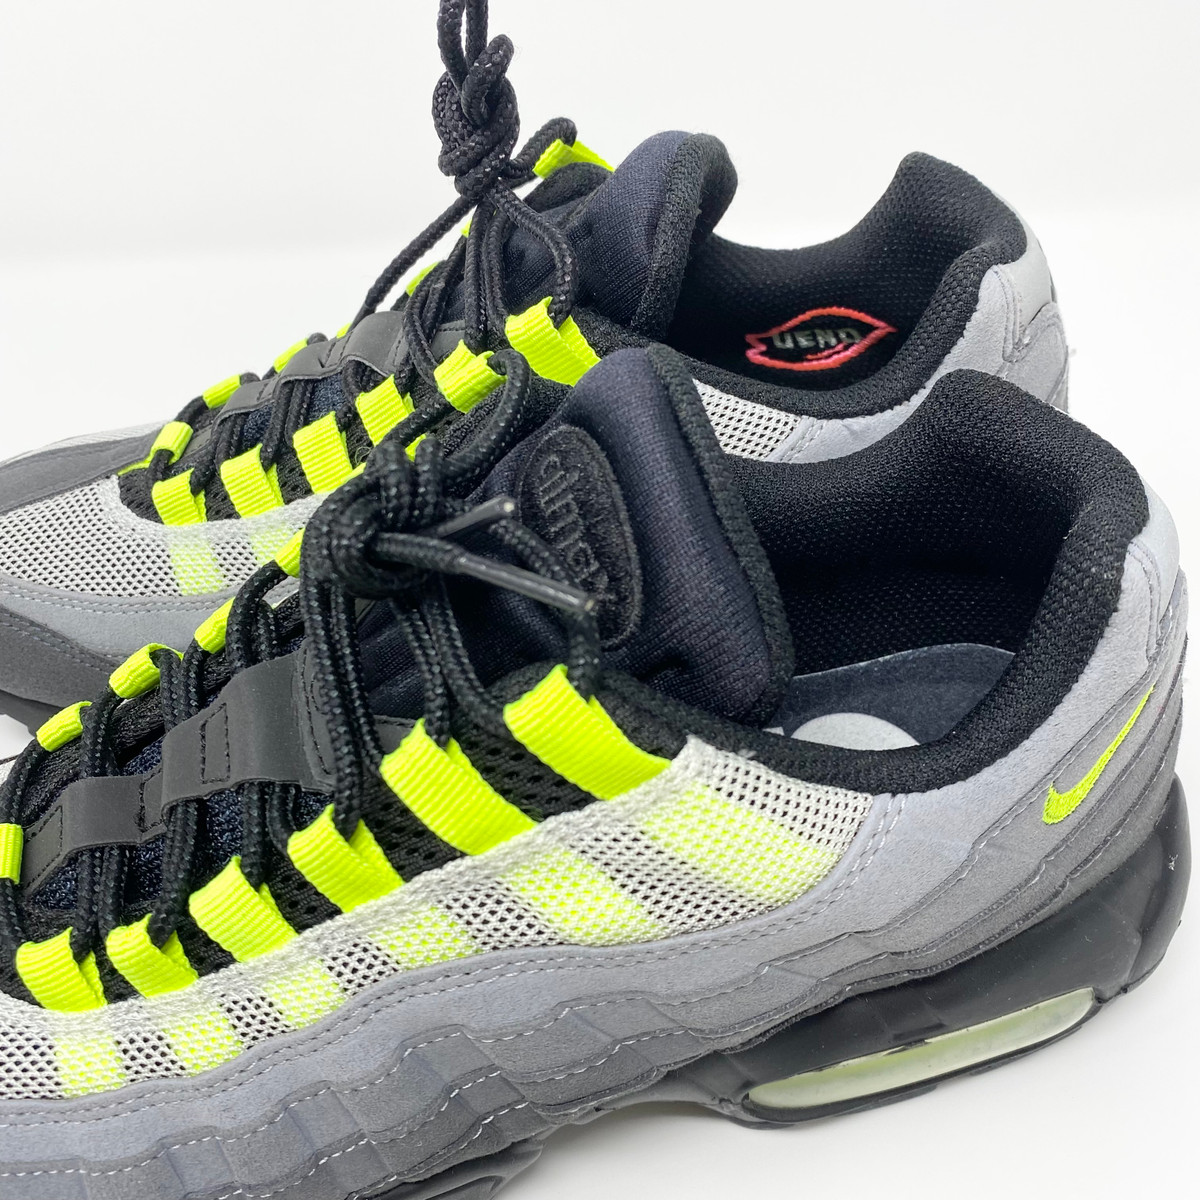 Nike Air Max 95 Mita Ueno Prototype